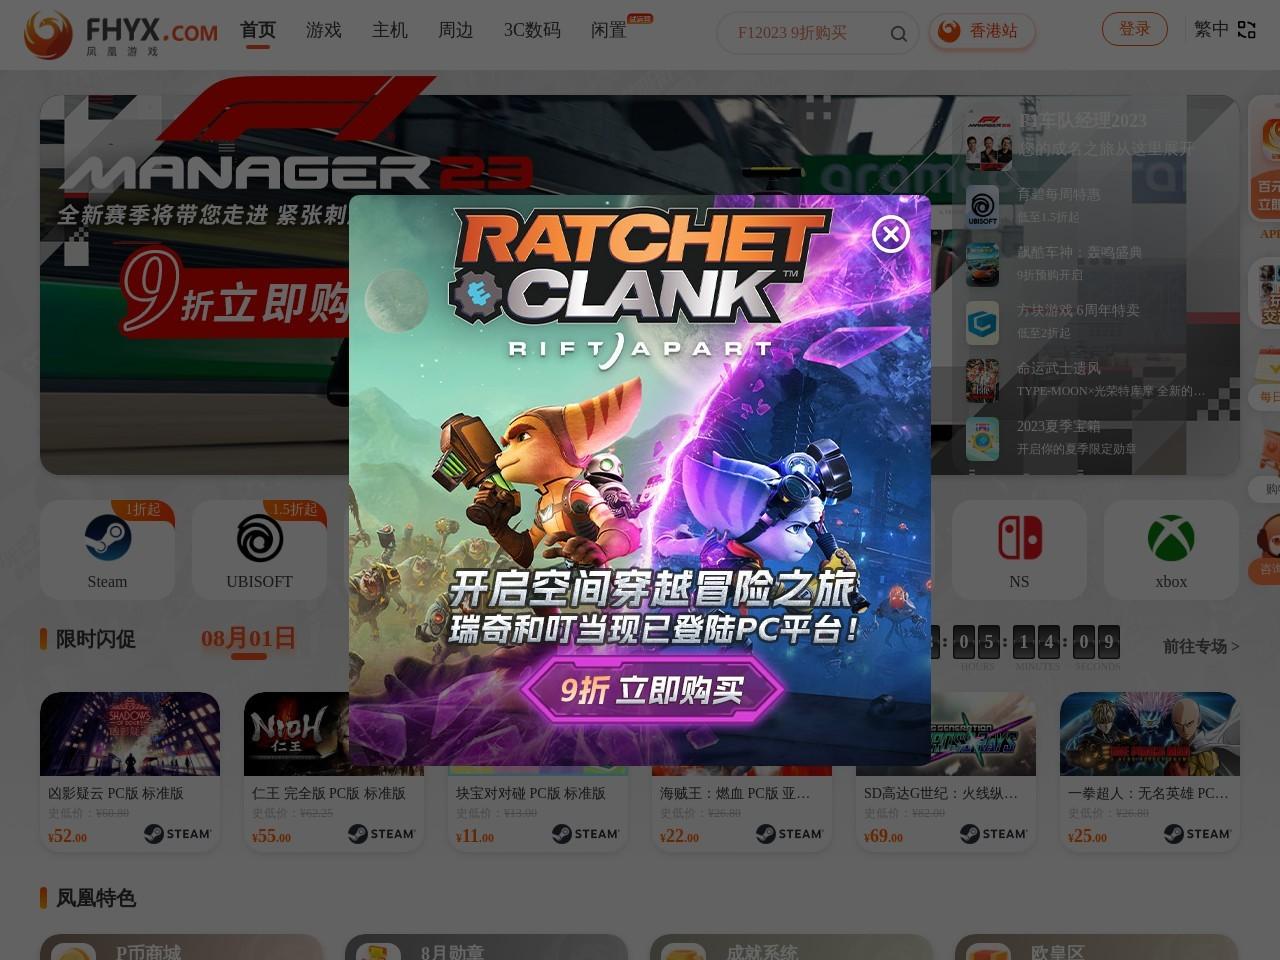 凤凰游戏-FHYX.COM